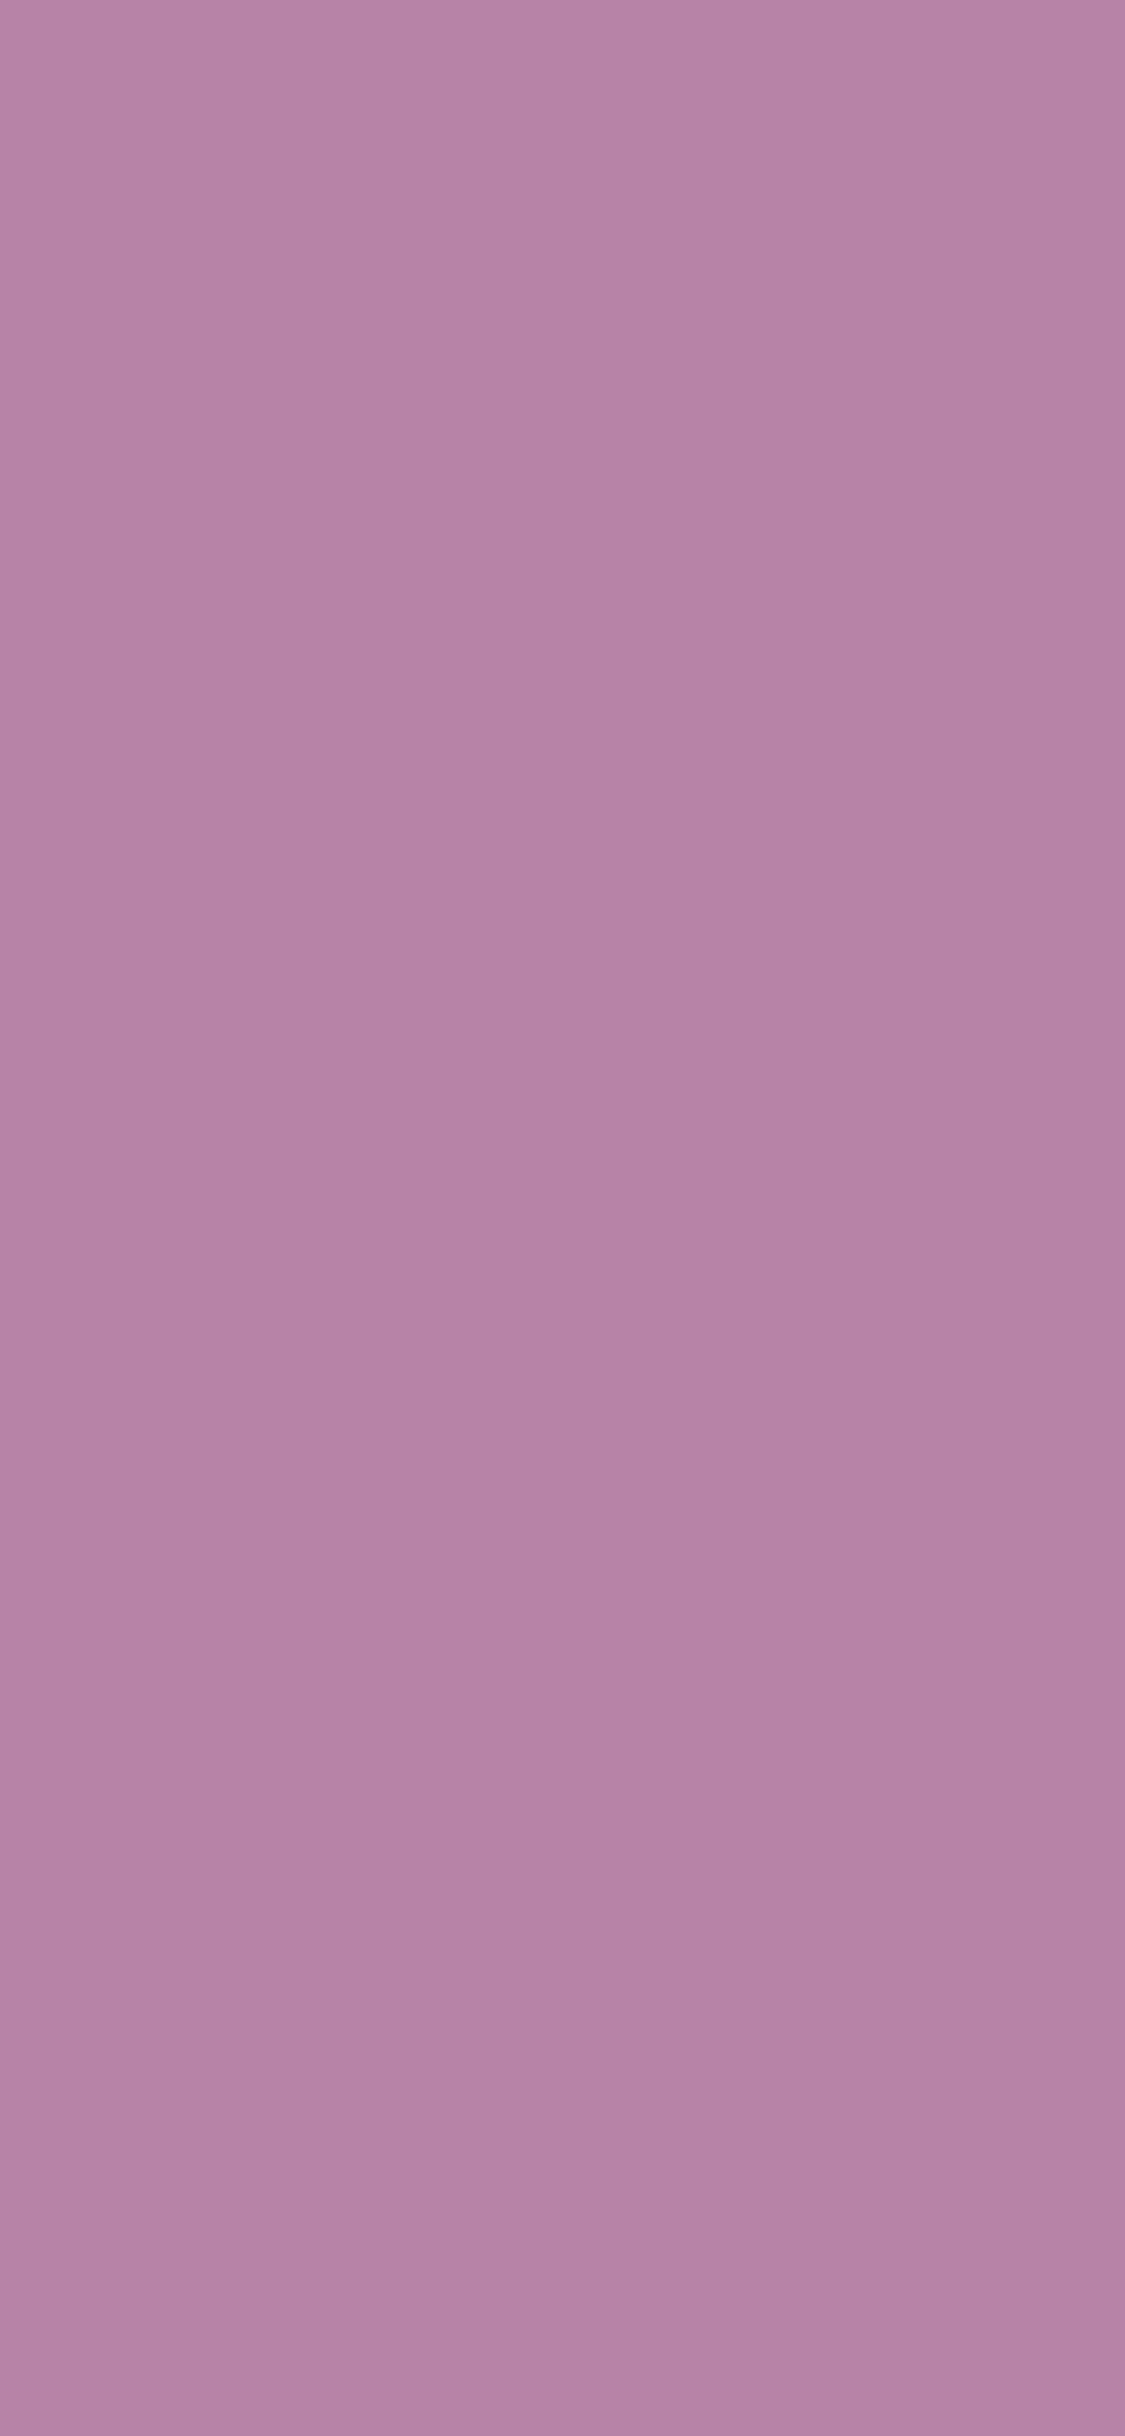 1125x2436 Opera Mauve Solid Color Background